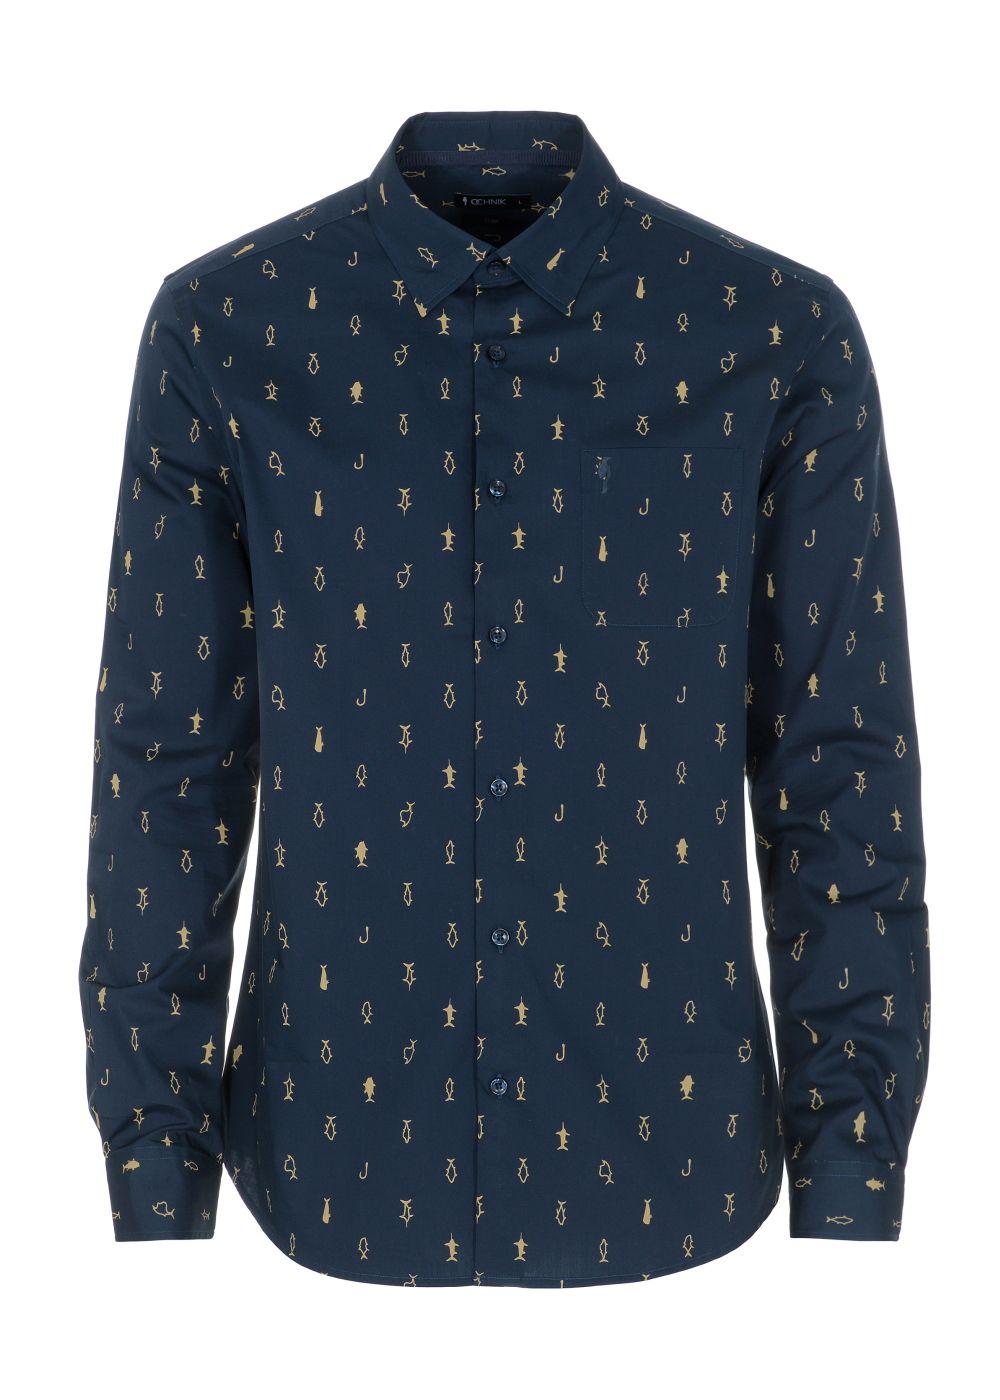 Koszula męska KOSMT-0262-69(W21)